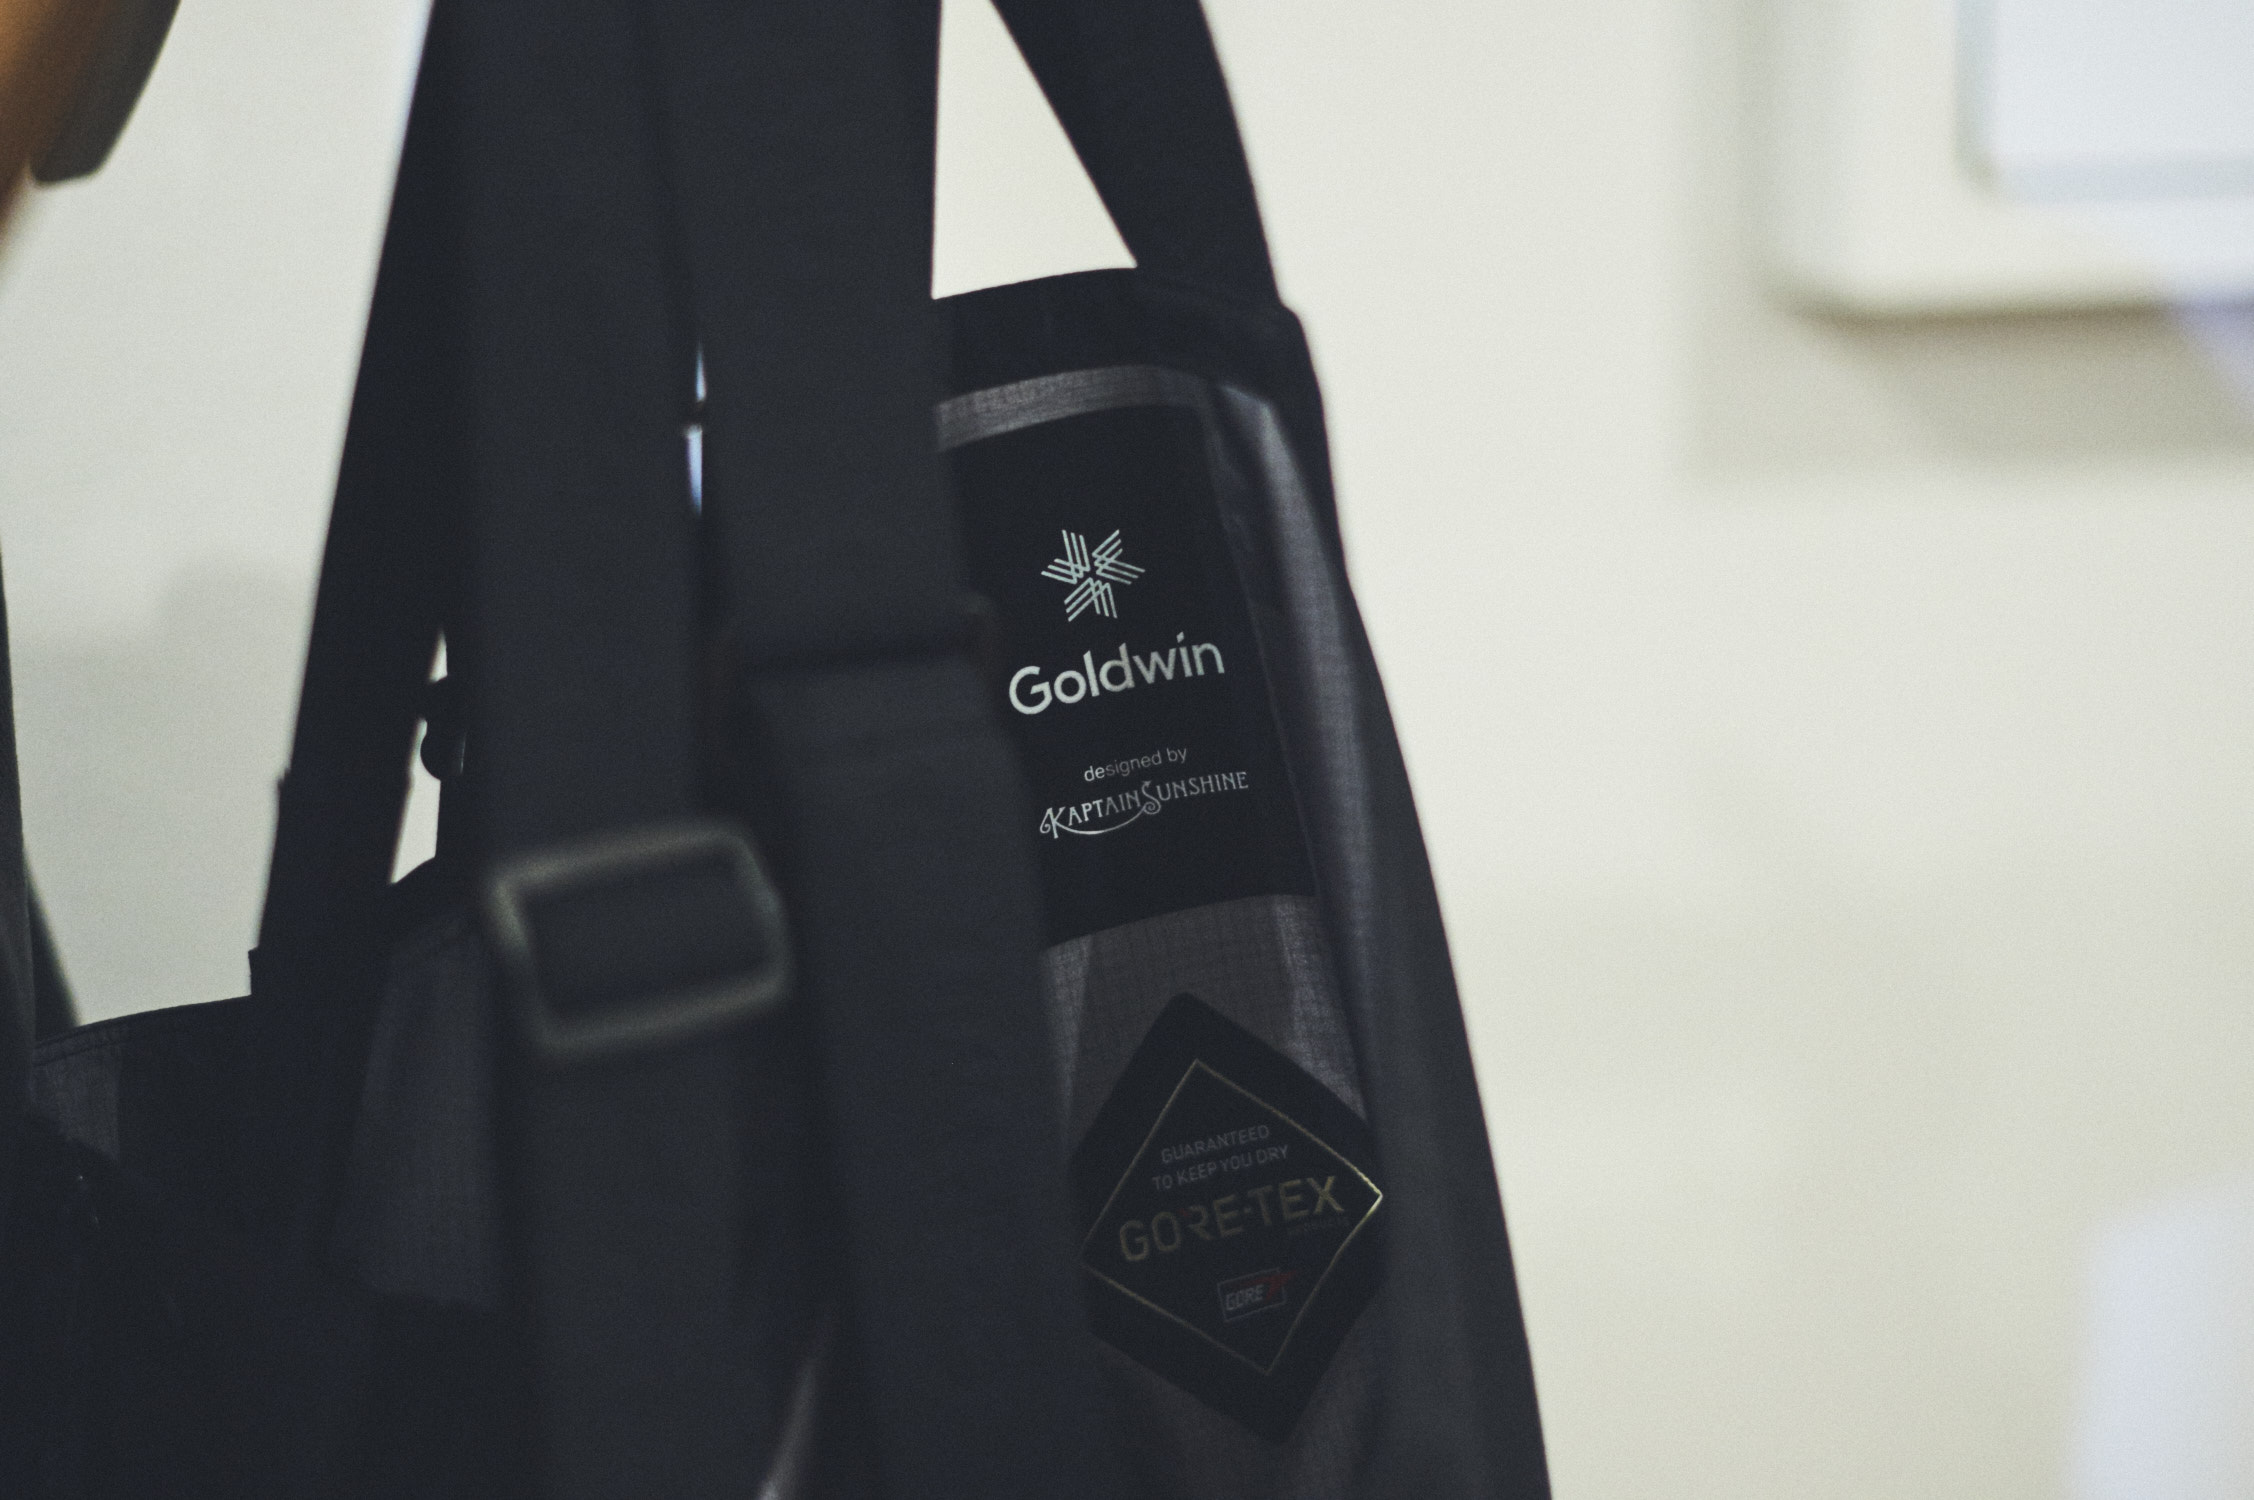 Goldwin、新しい価値観持ったスキーウェア発売 児島晋輔とコラボ